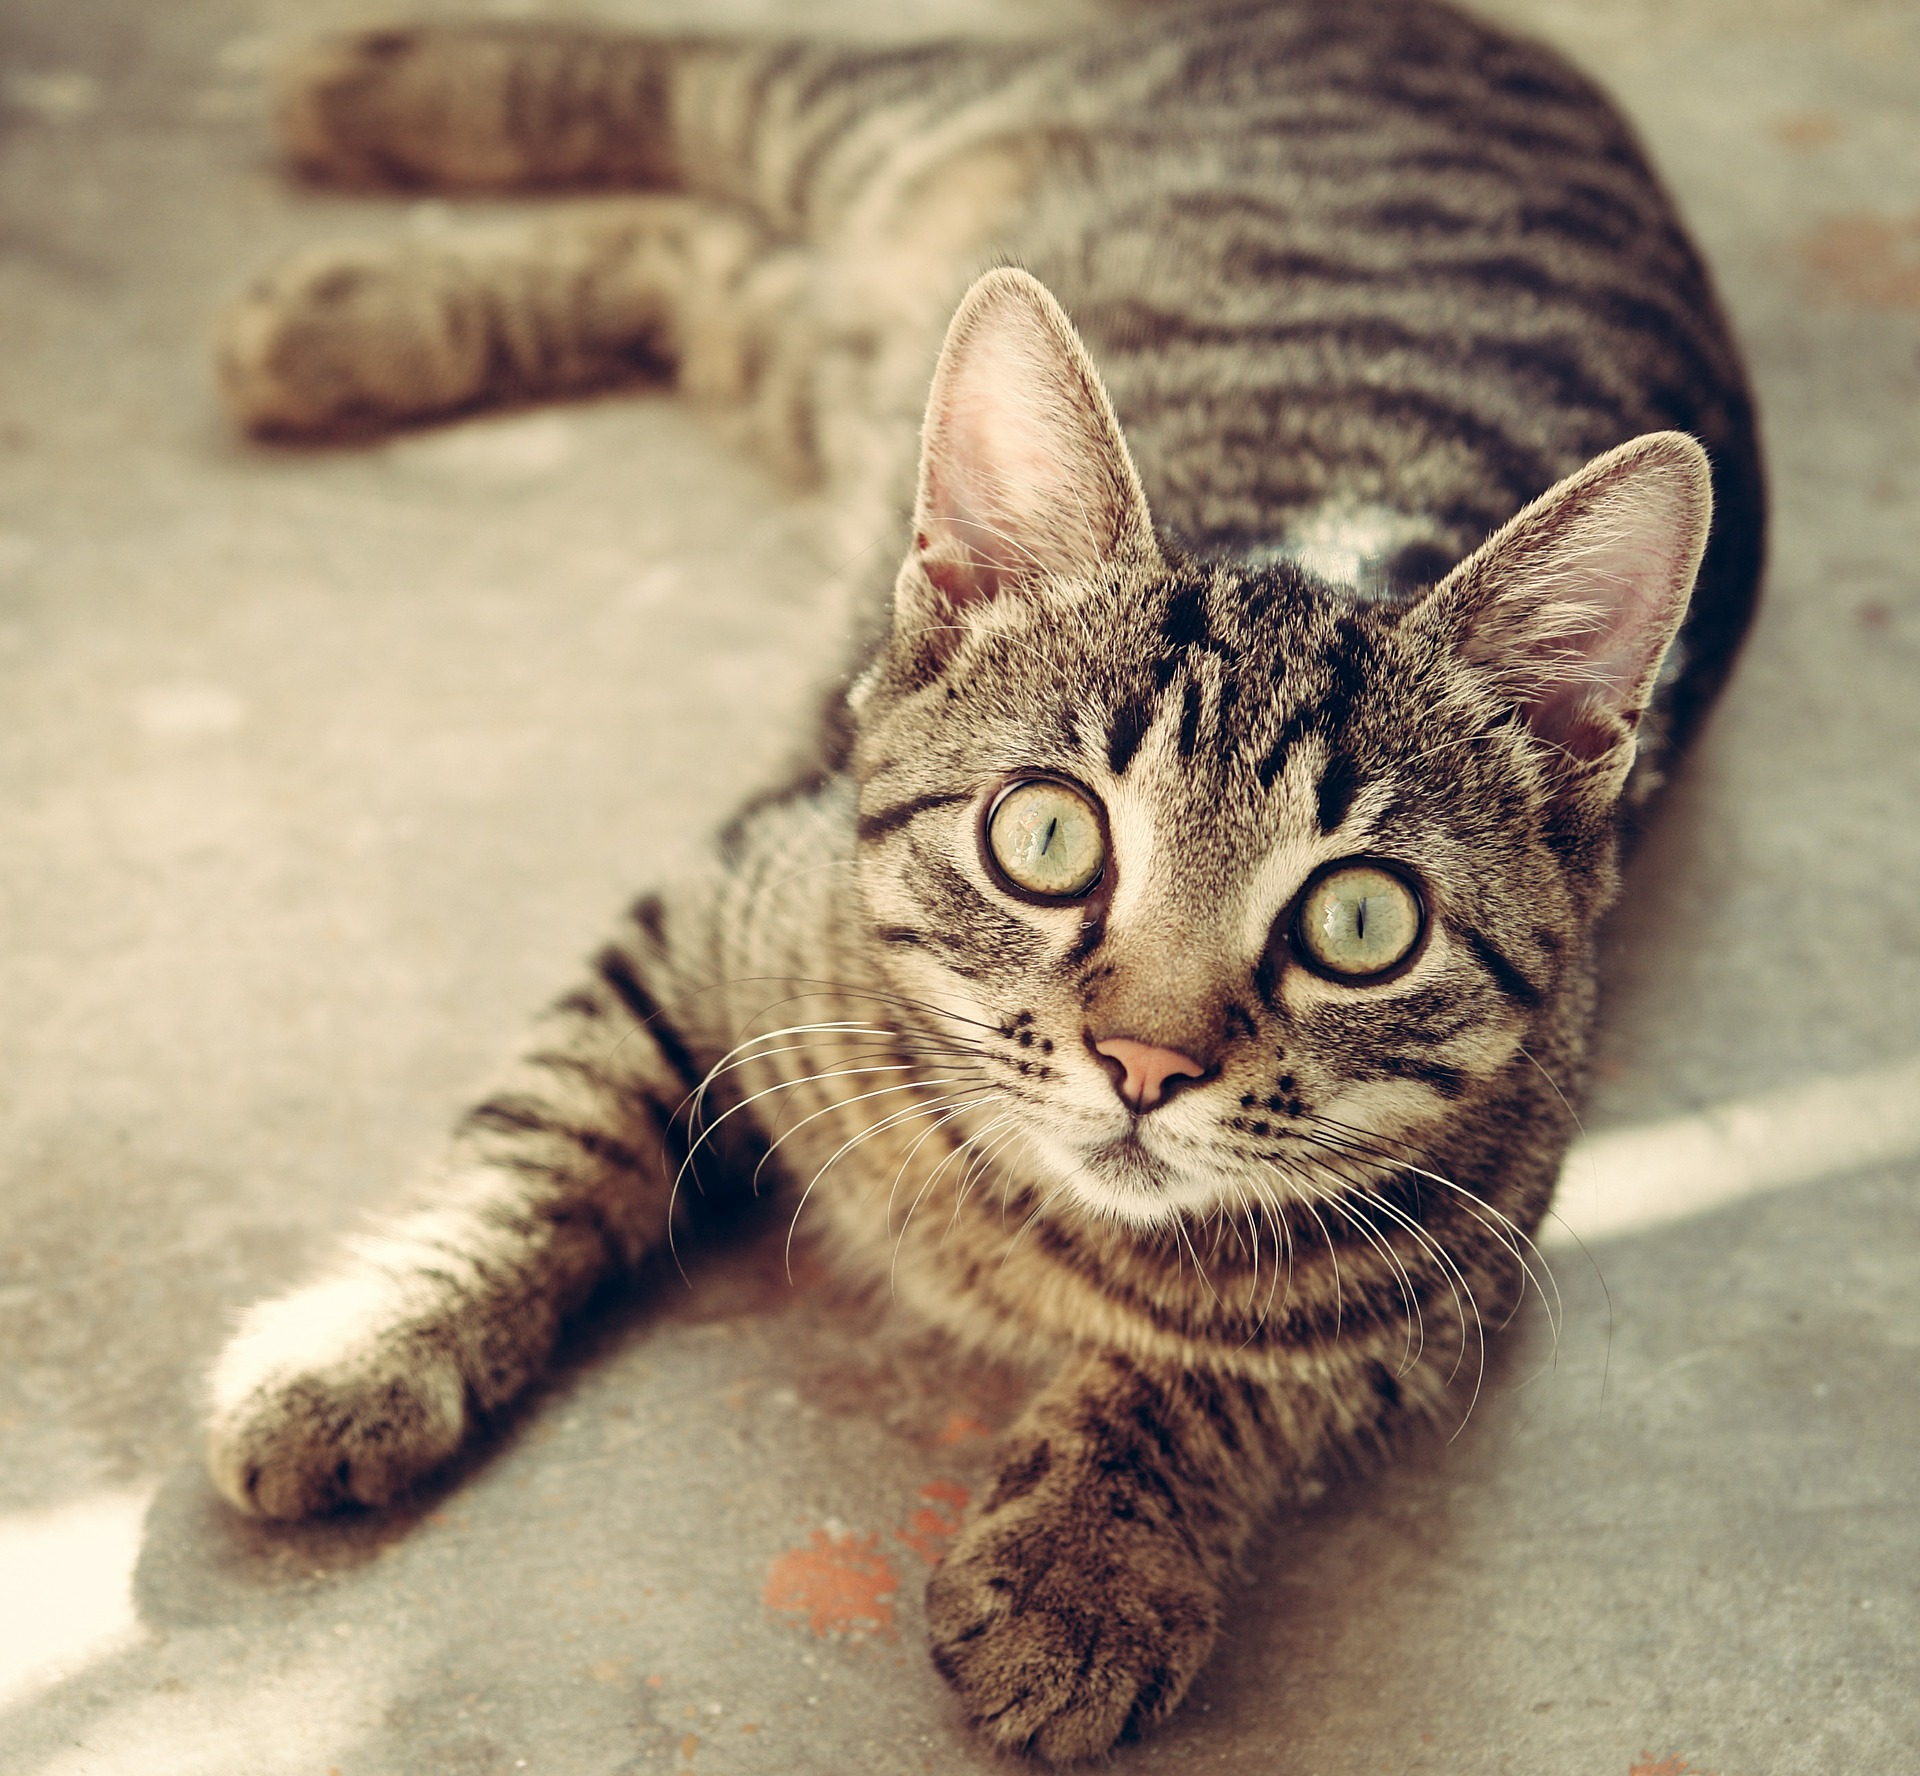 cat-618470_1920.jpg